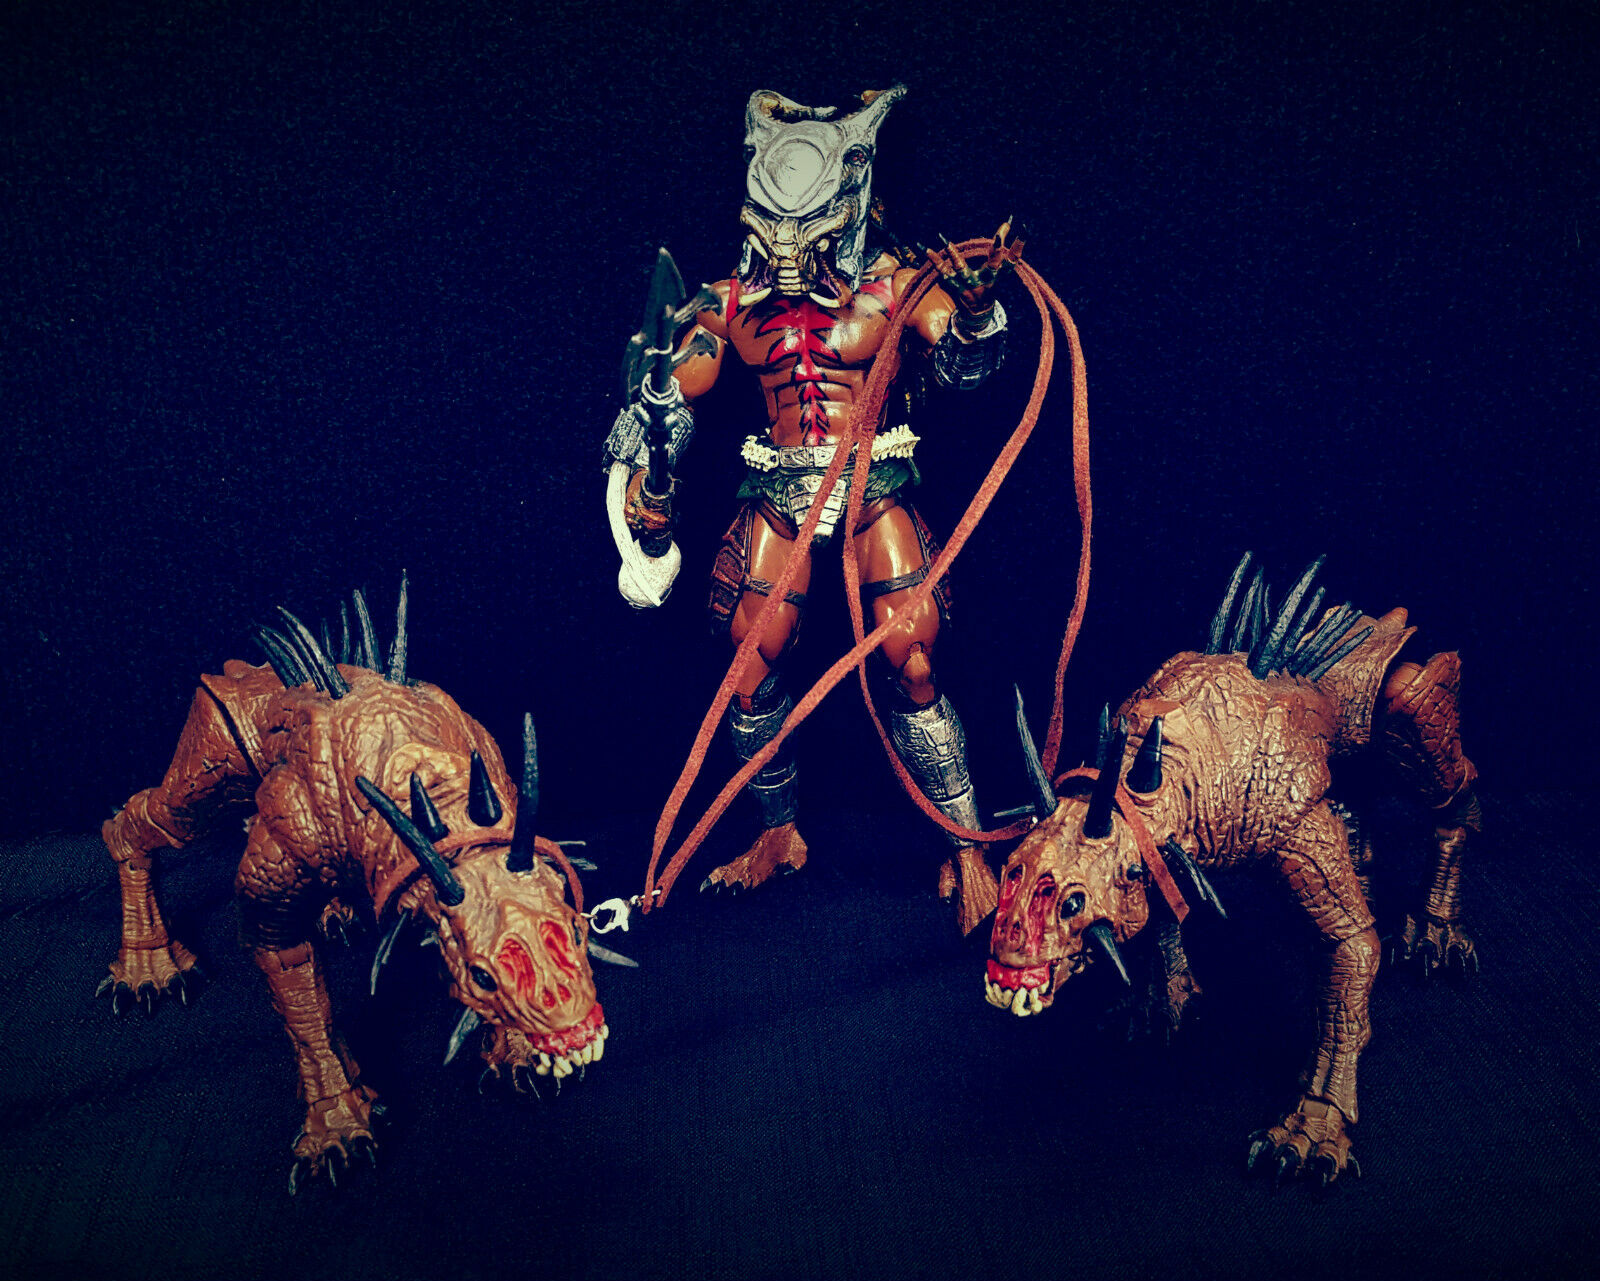 NECA Custom Tribal Predator & The Hounds Of Justice Action Figure